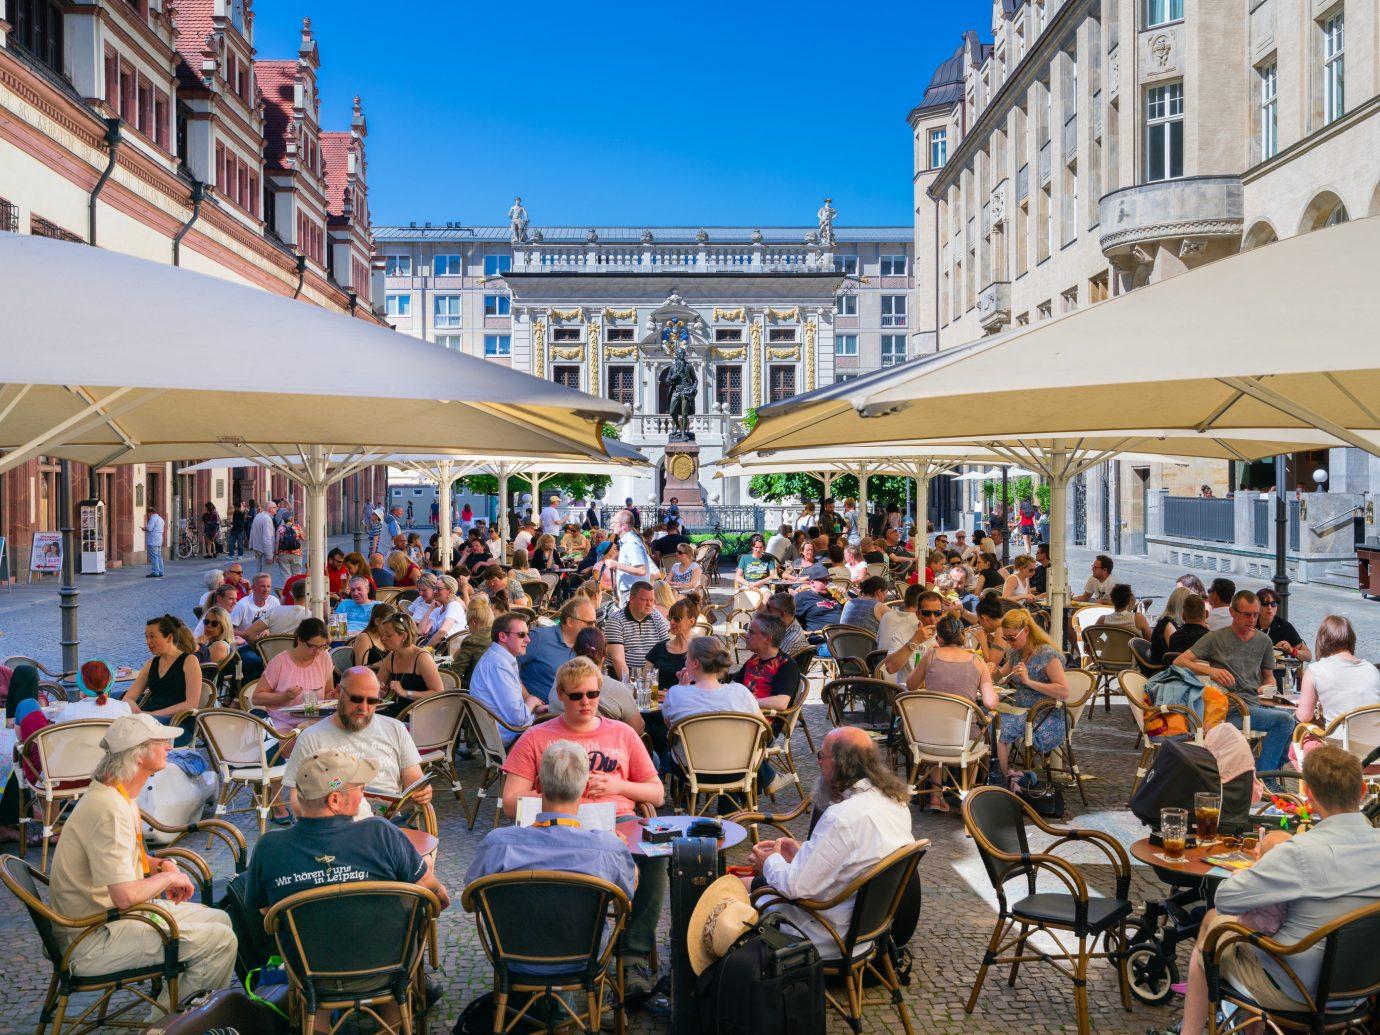 Berlin Germany Munich Trip Ideas crowd tourism City recreation marketplace vacation